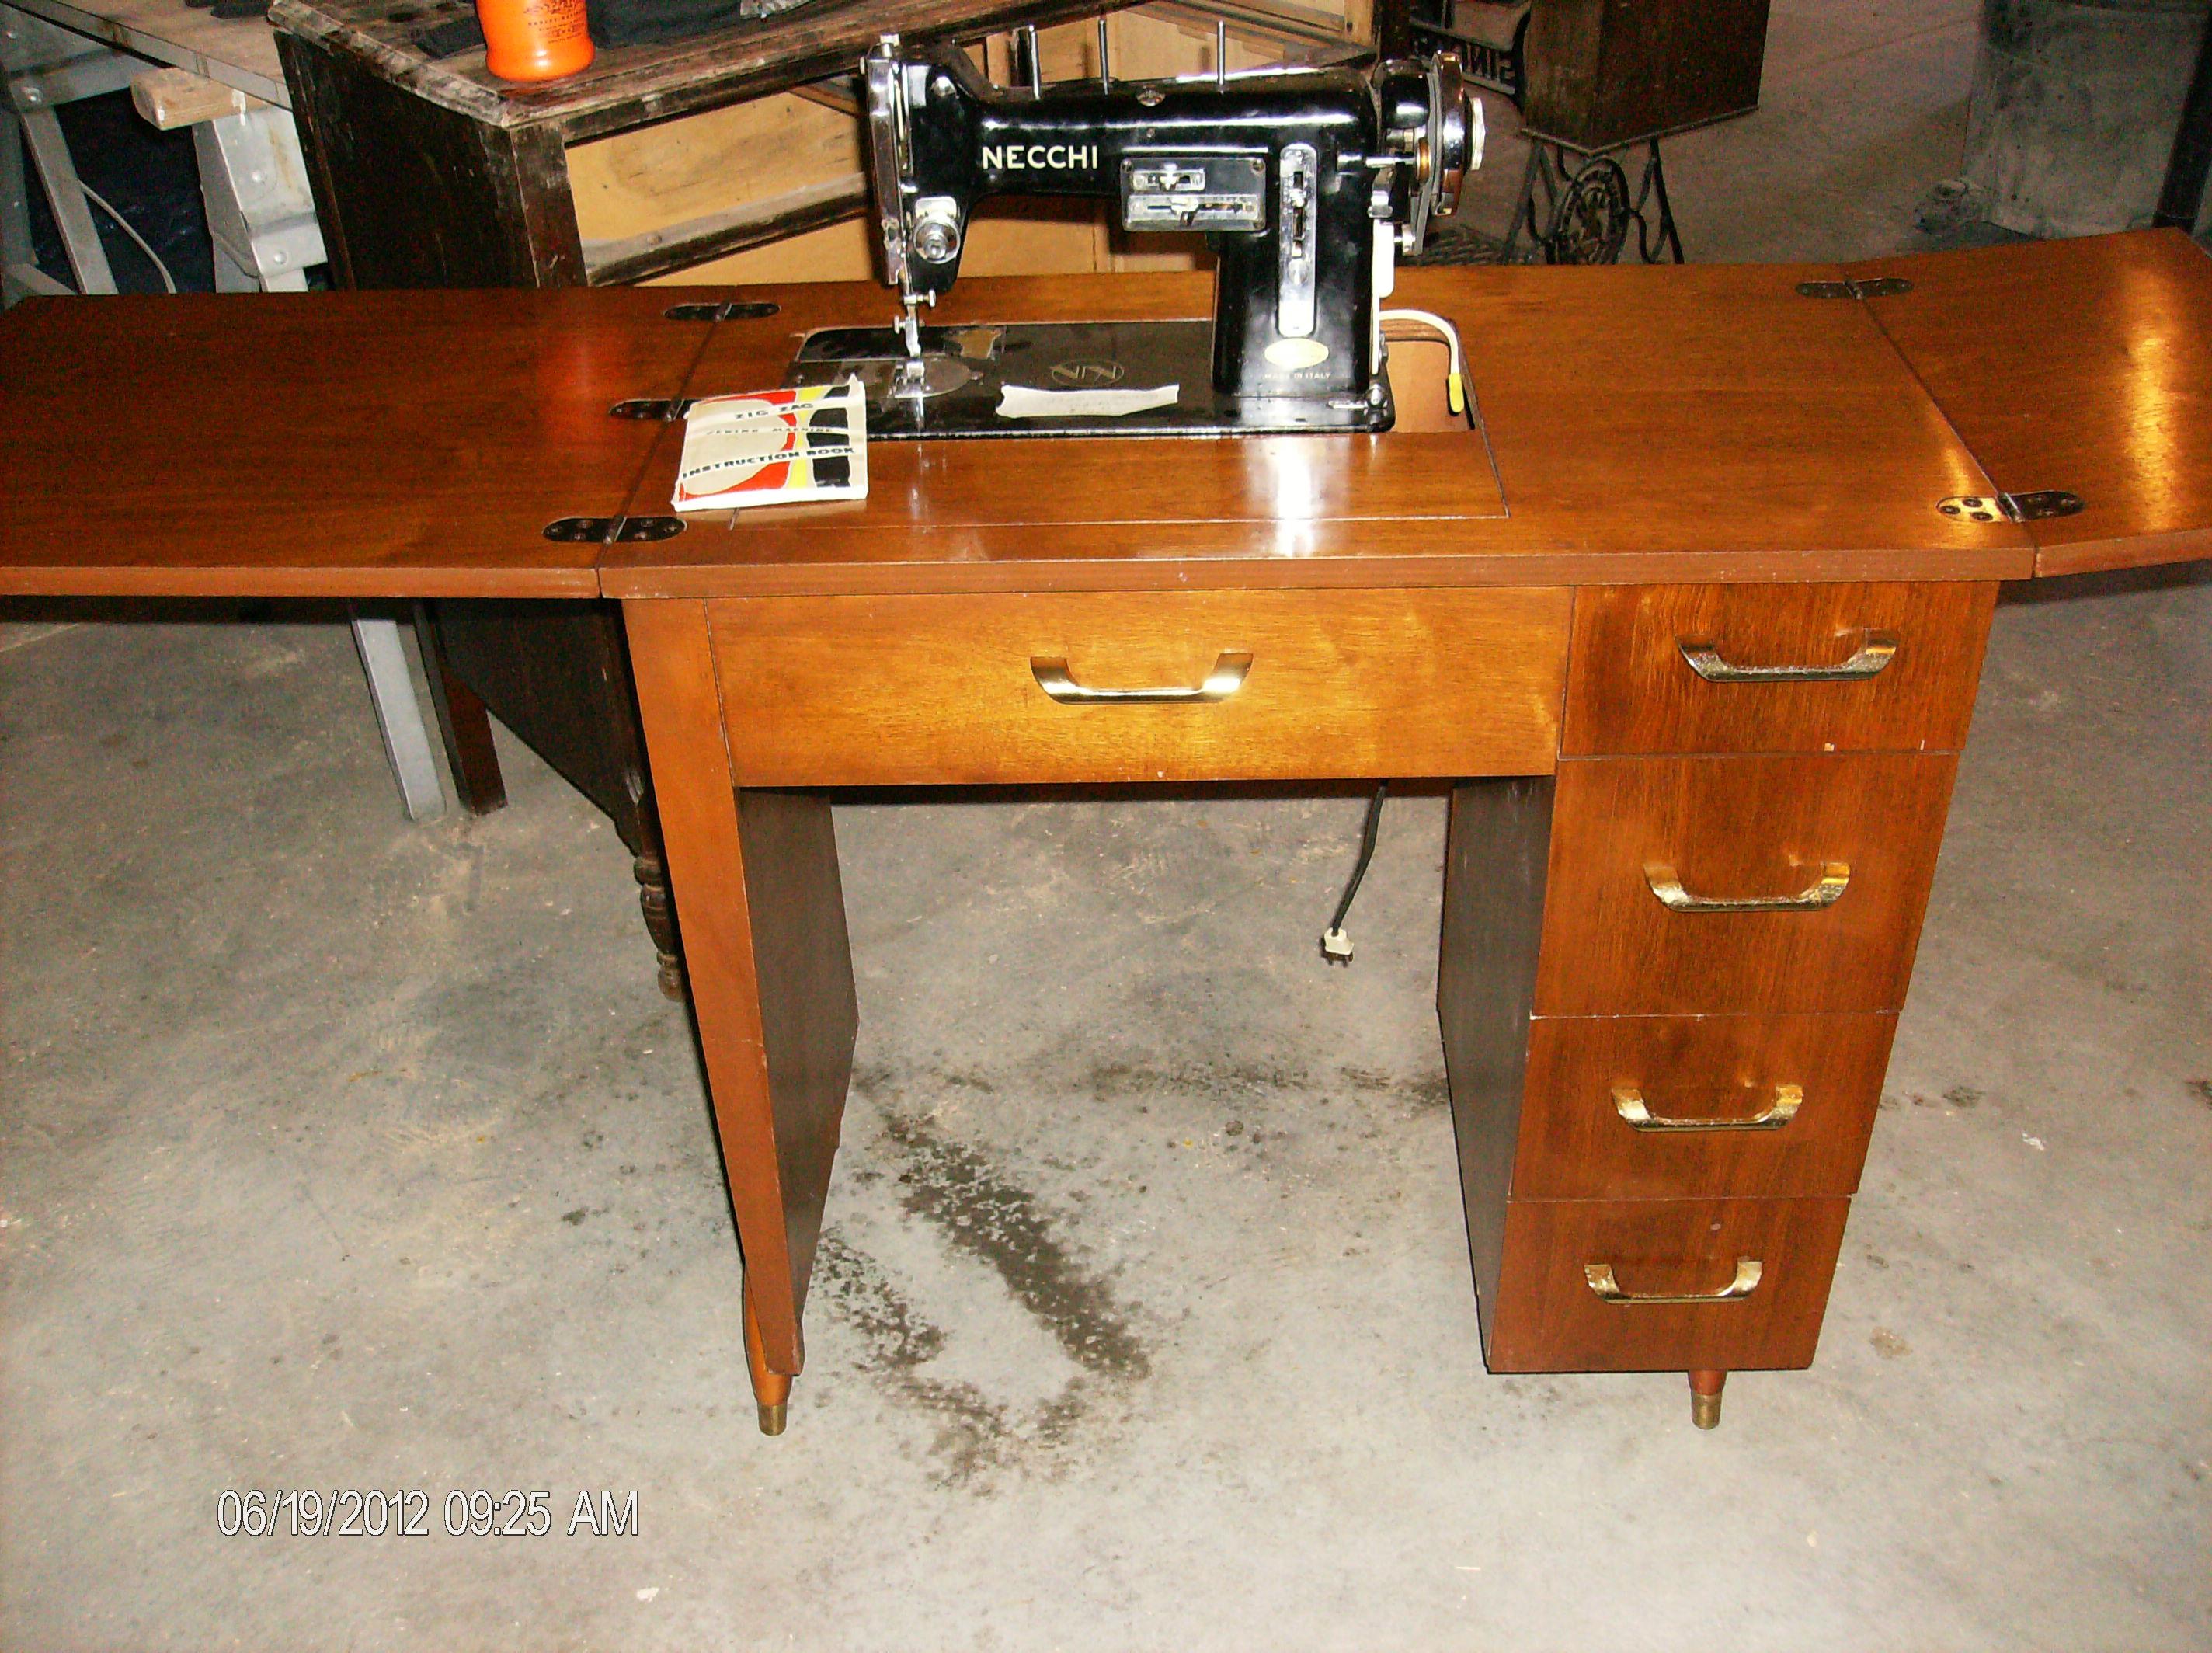 10 Necchi In Cabnit Supernova Sewing Machine Threading Diagram Vintage Attached Images